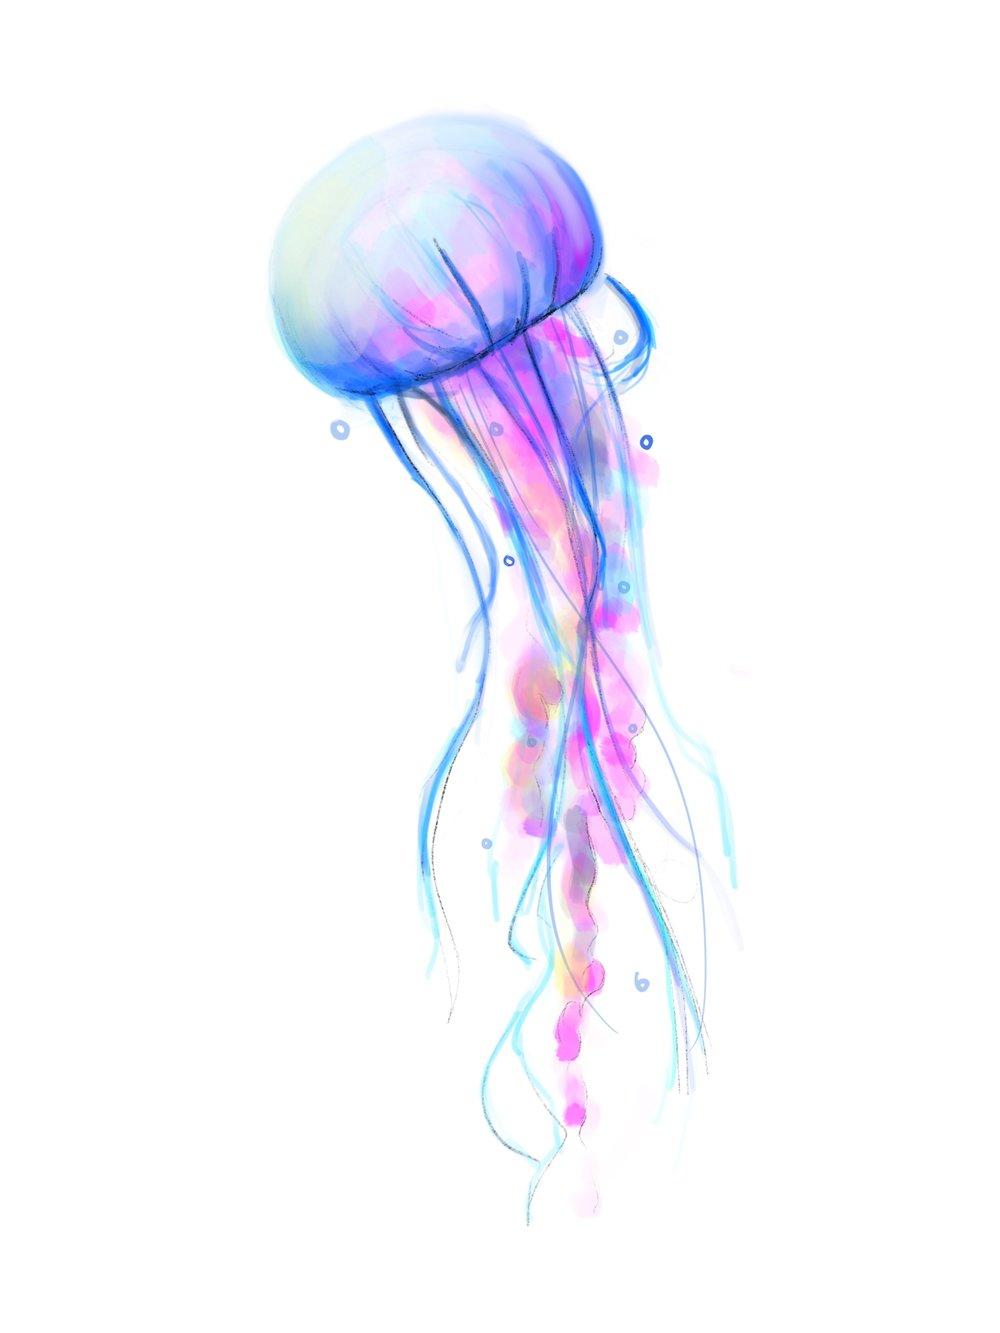 Jellyfish01.jpg